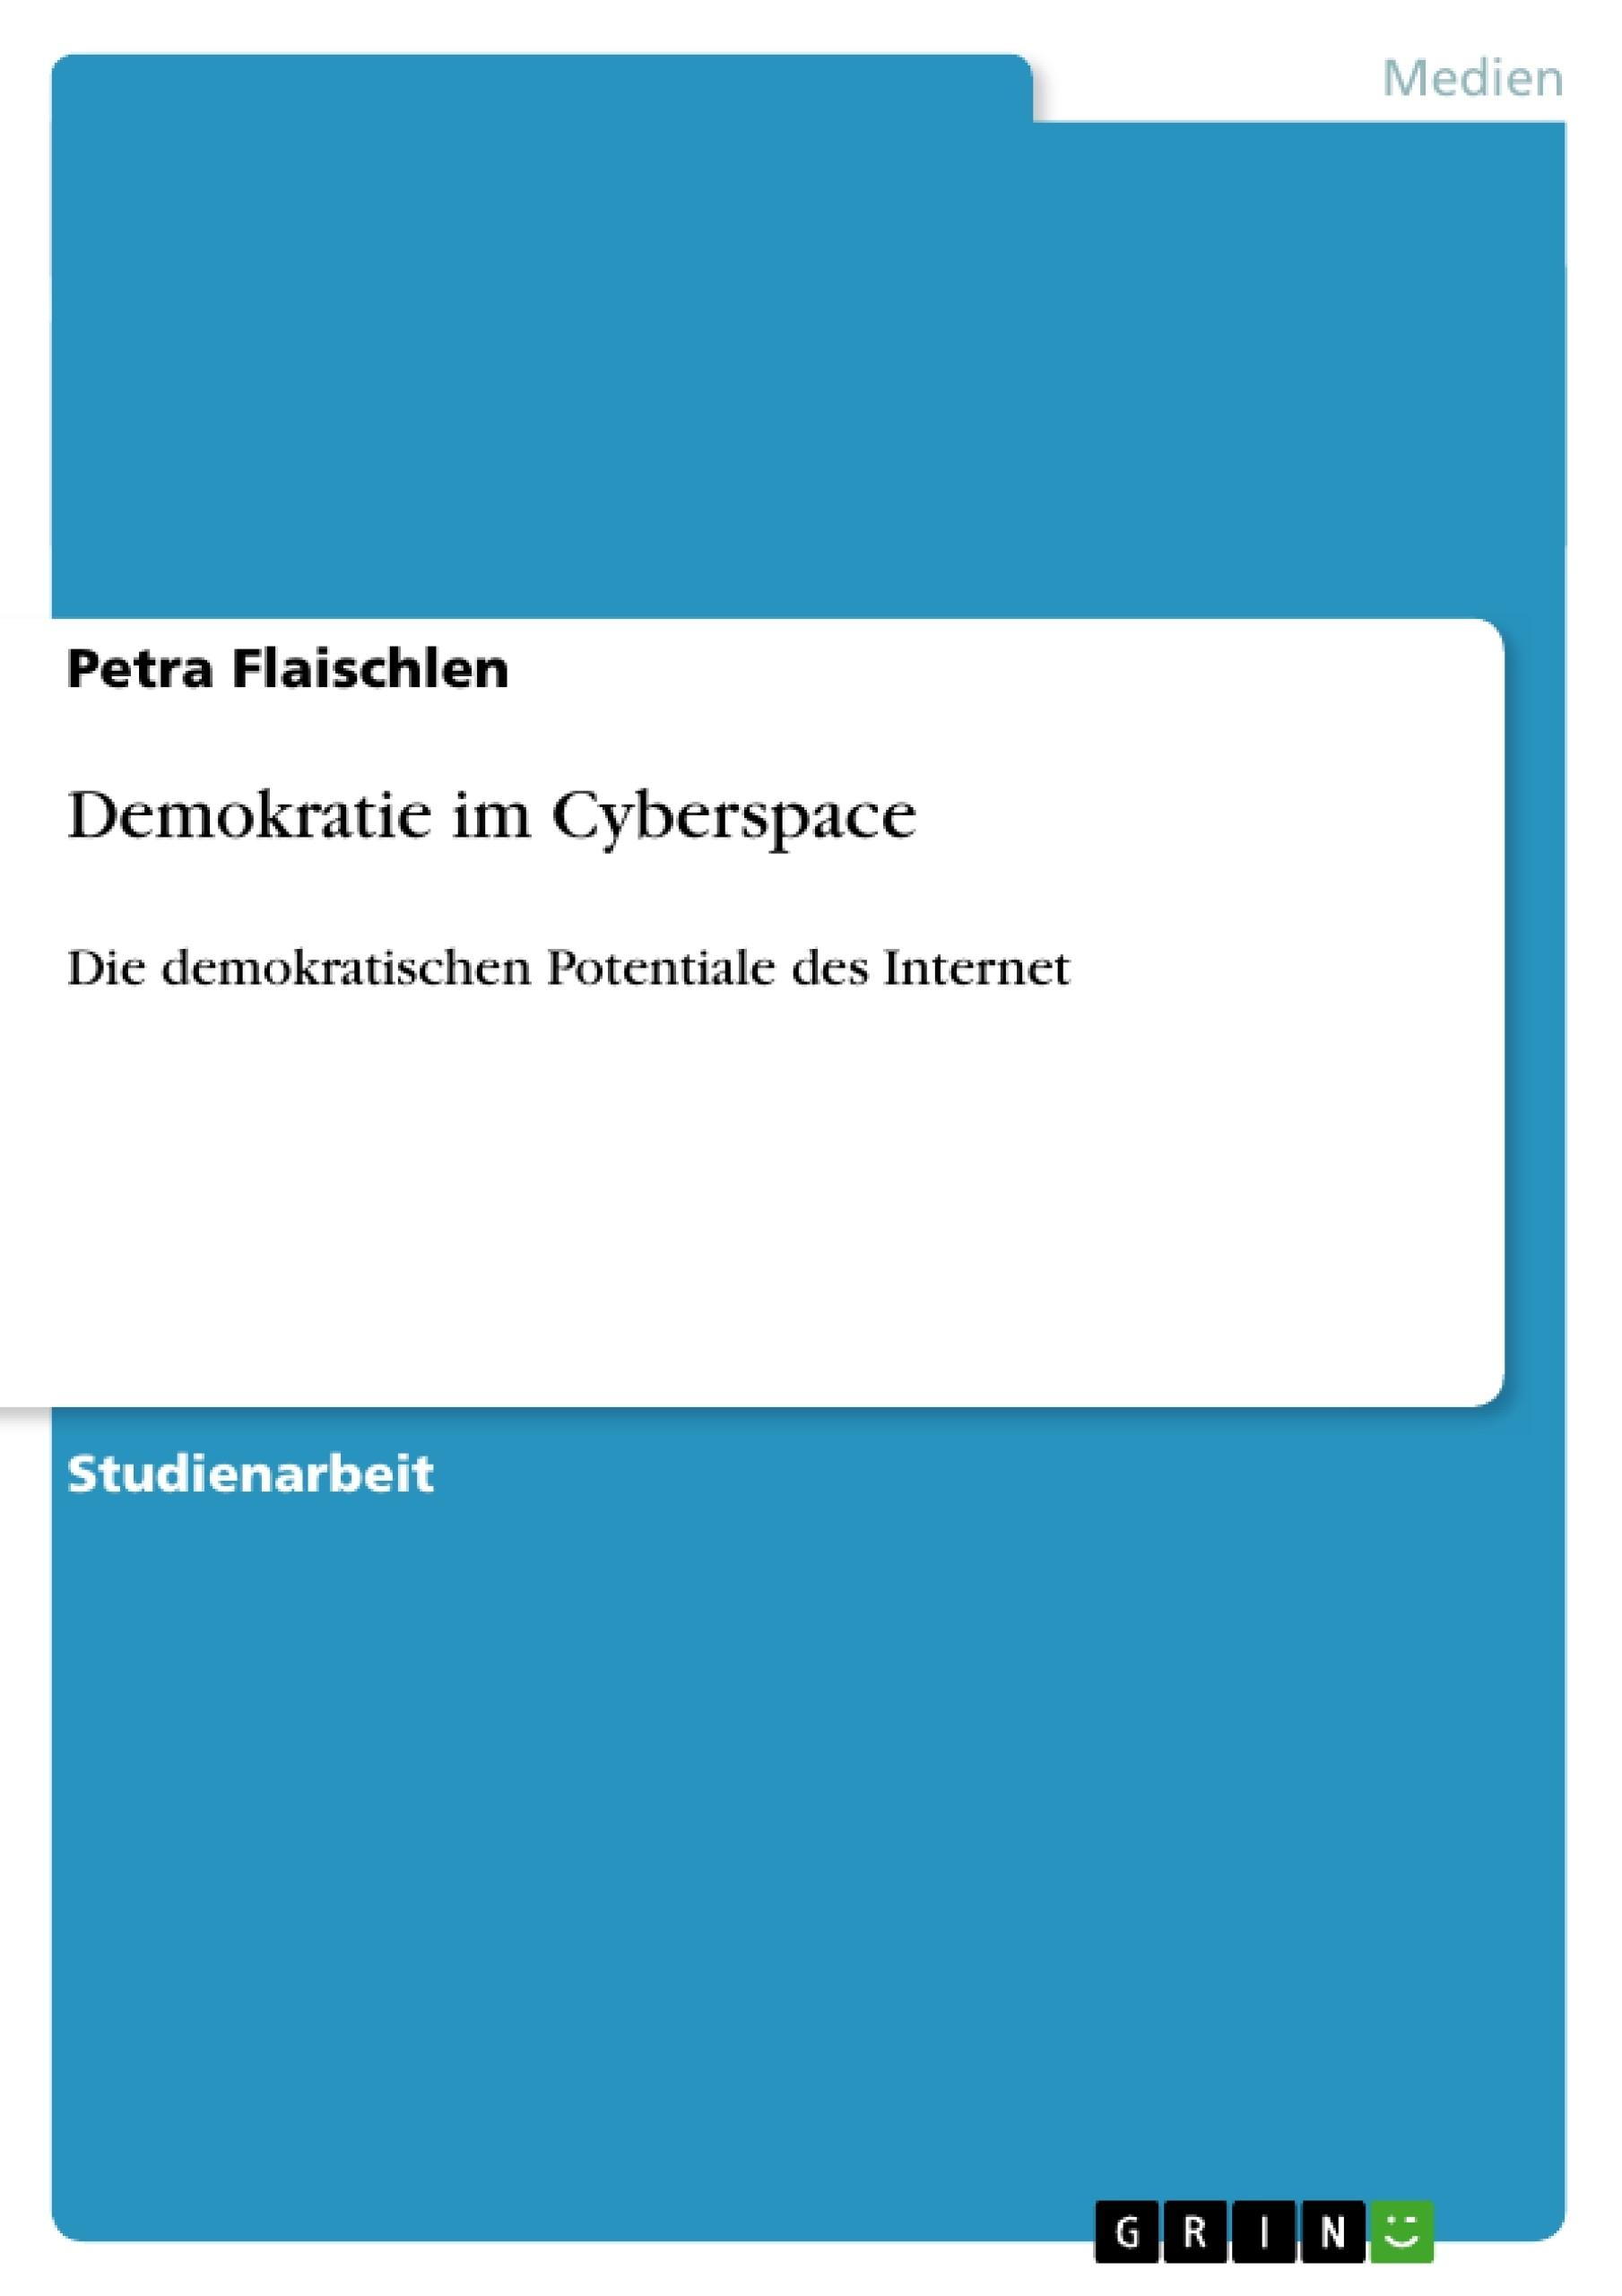 Titel: Demokratie im Cyberspace